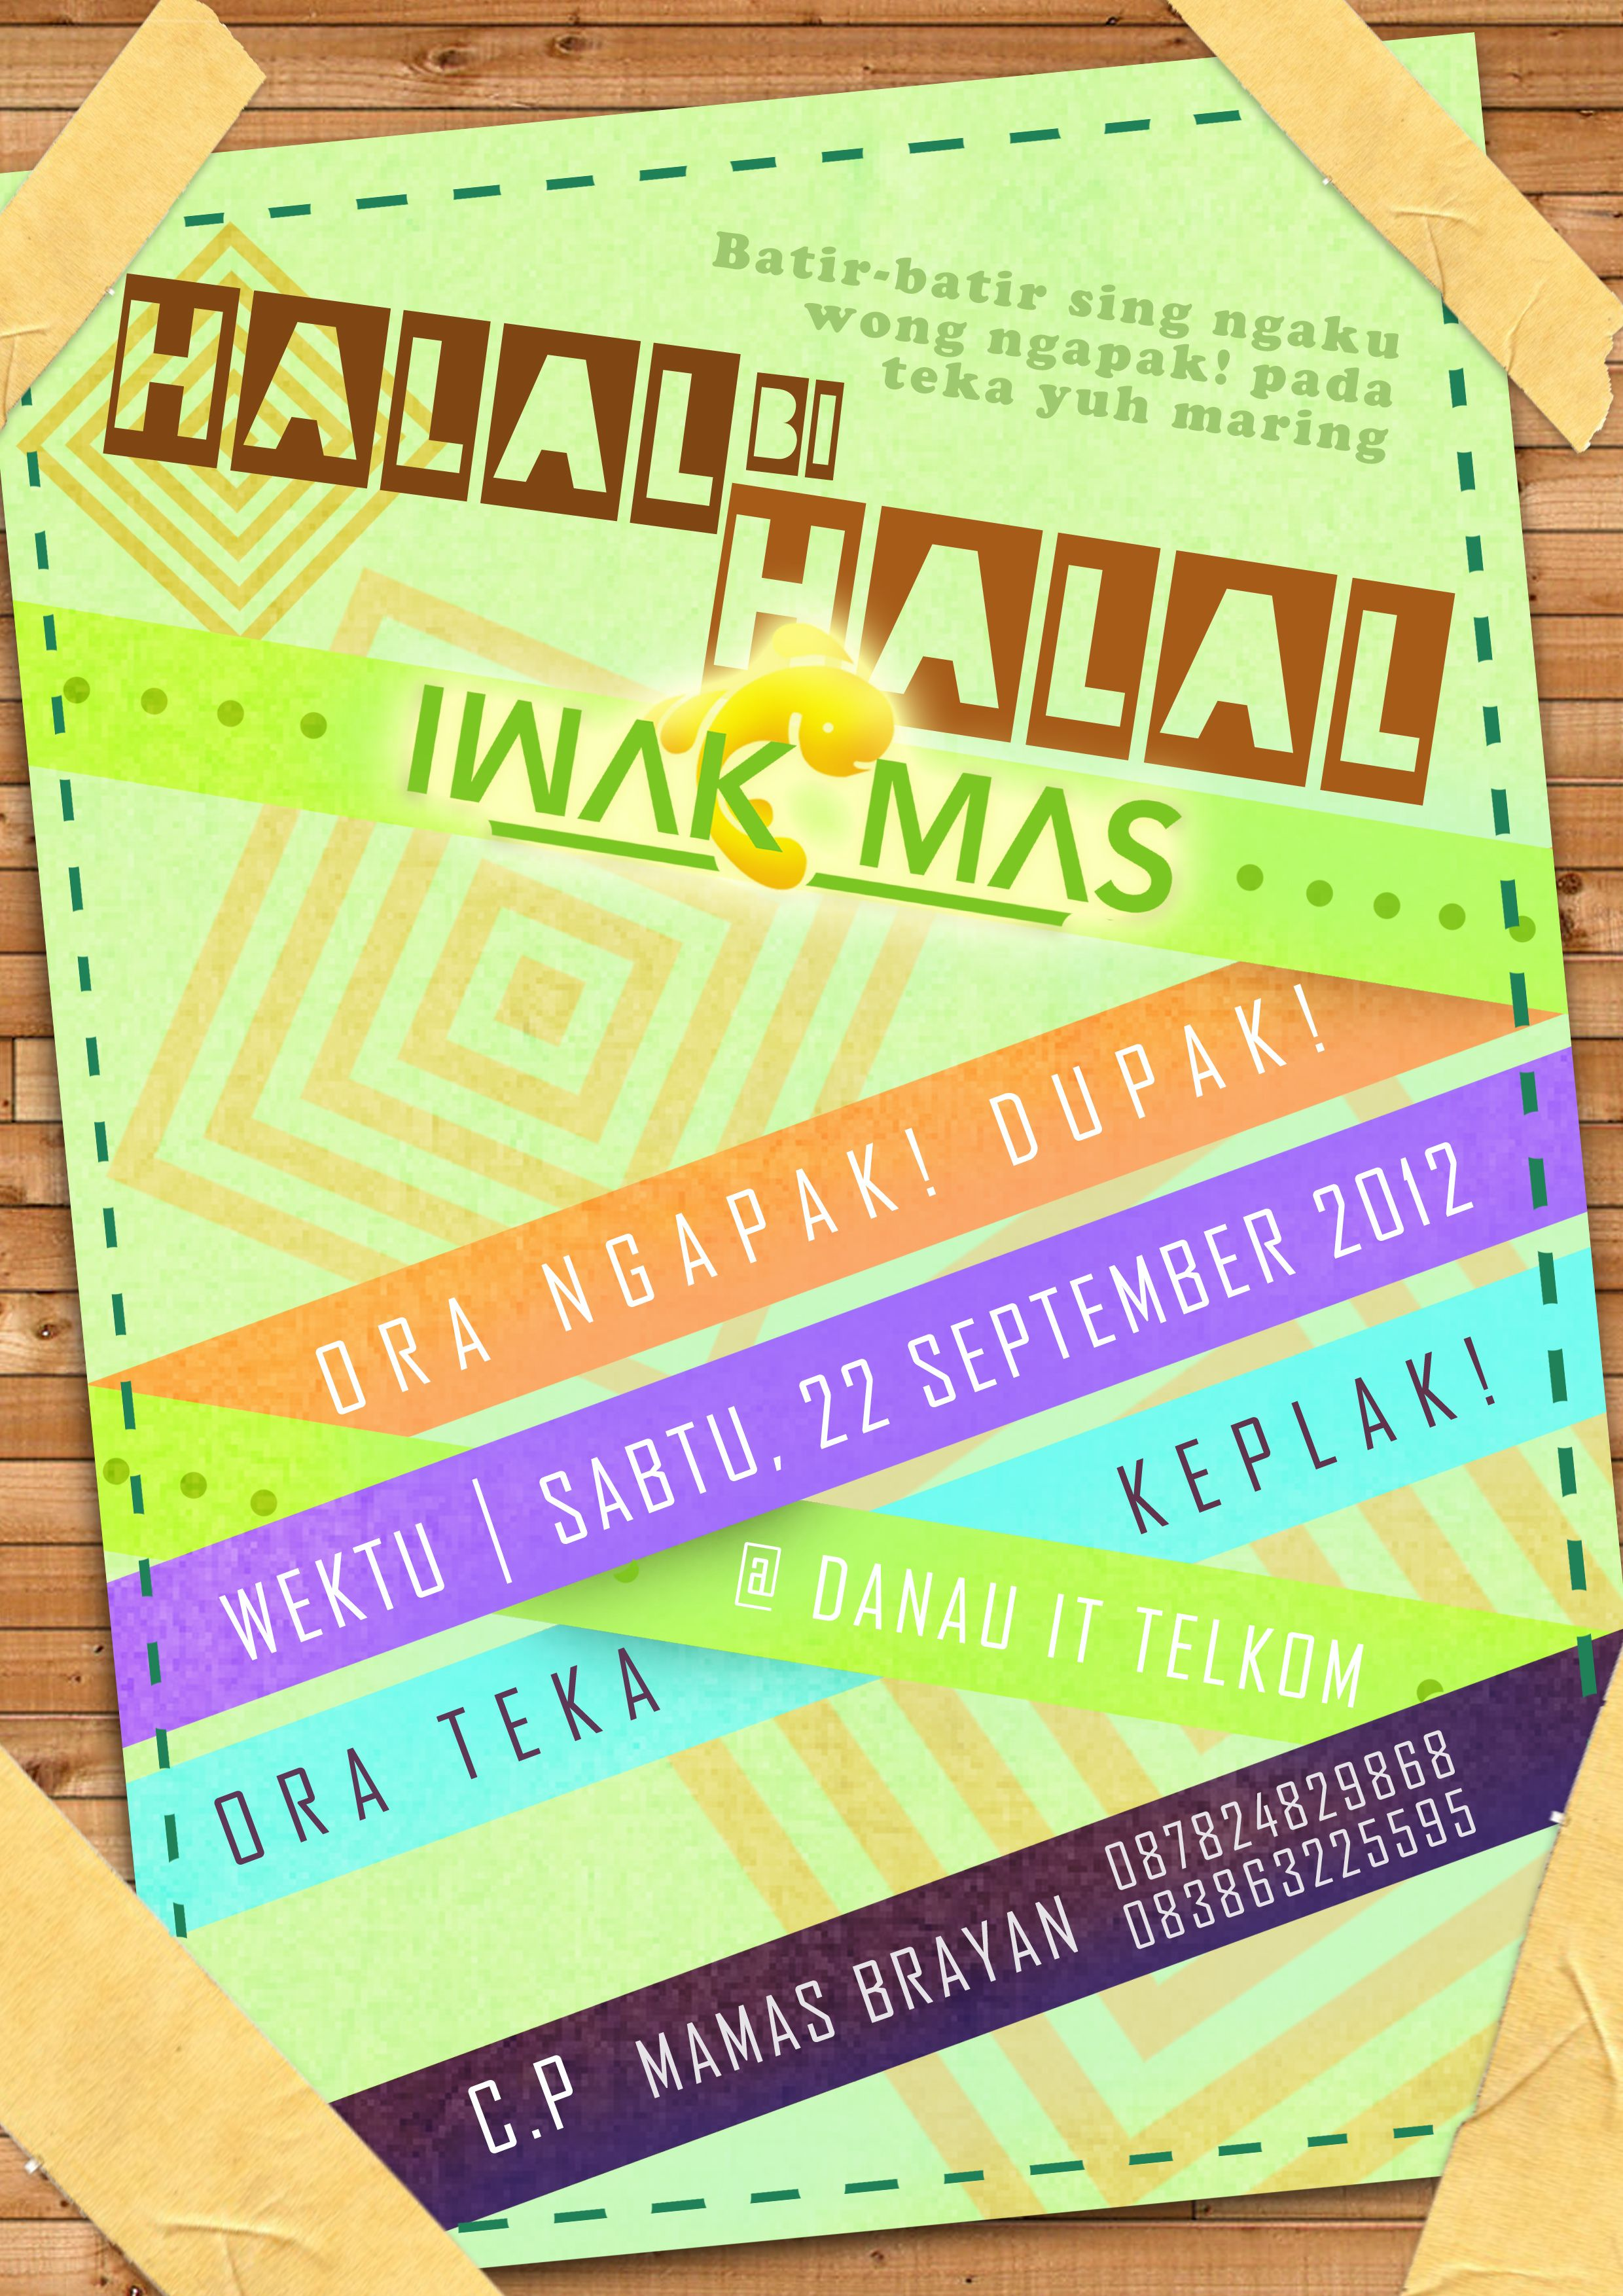 Iwakmas Halal Bi Halal 2012 Poster Work Poster And Pamflets